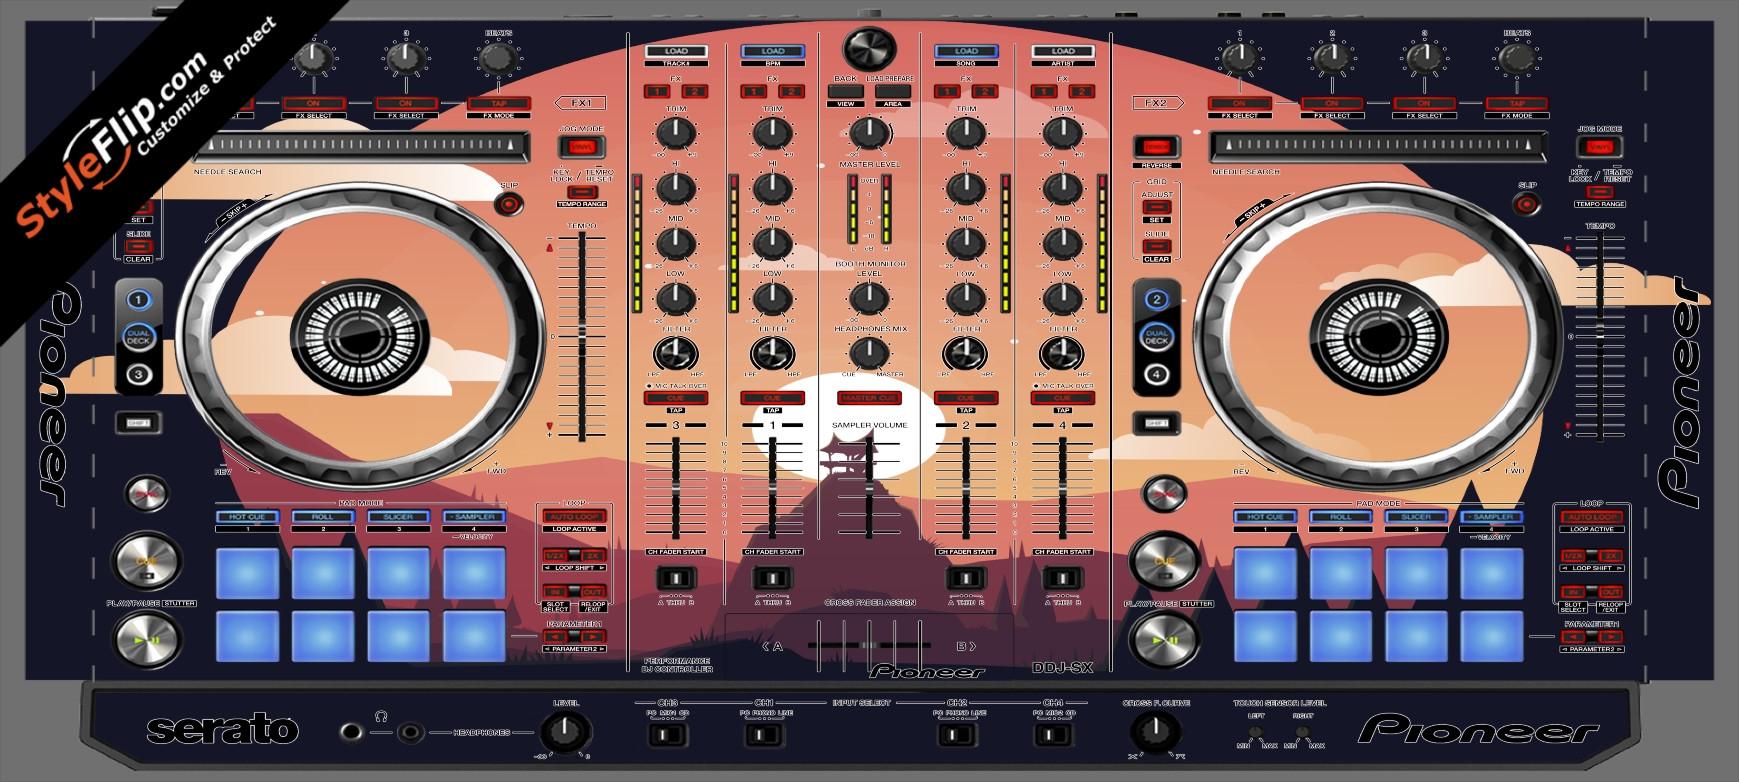 Nightfall  Pioneer DDJ-SX